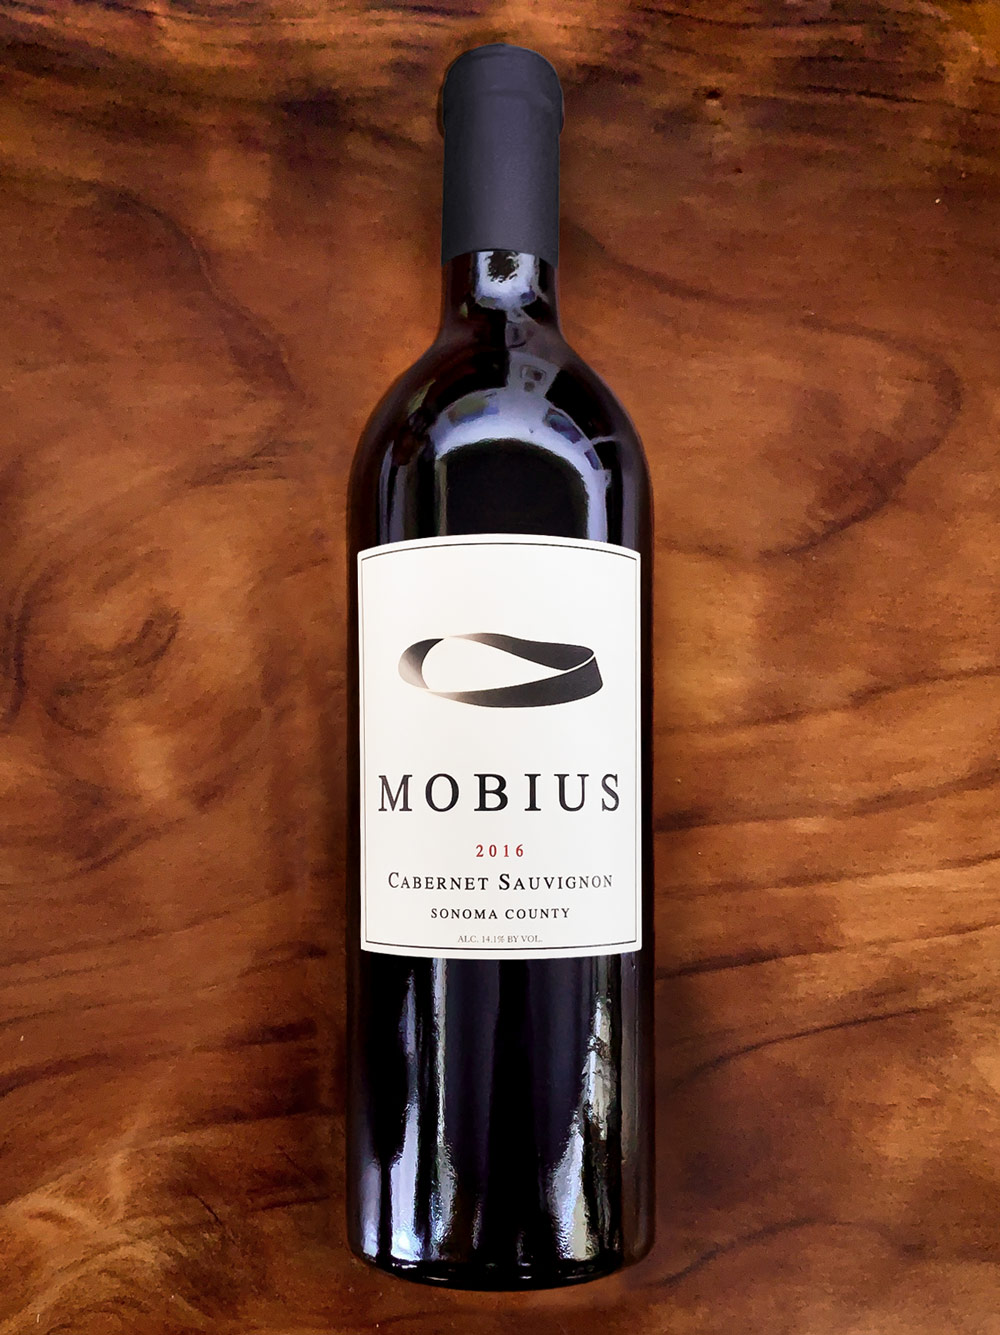 2016 Mobius Sonoma County Cabernet